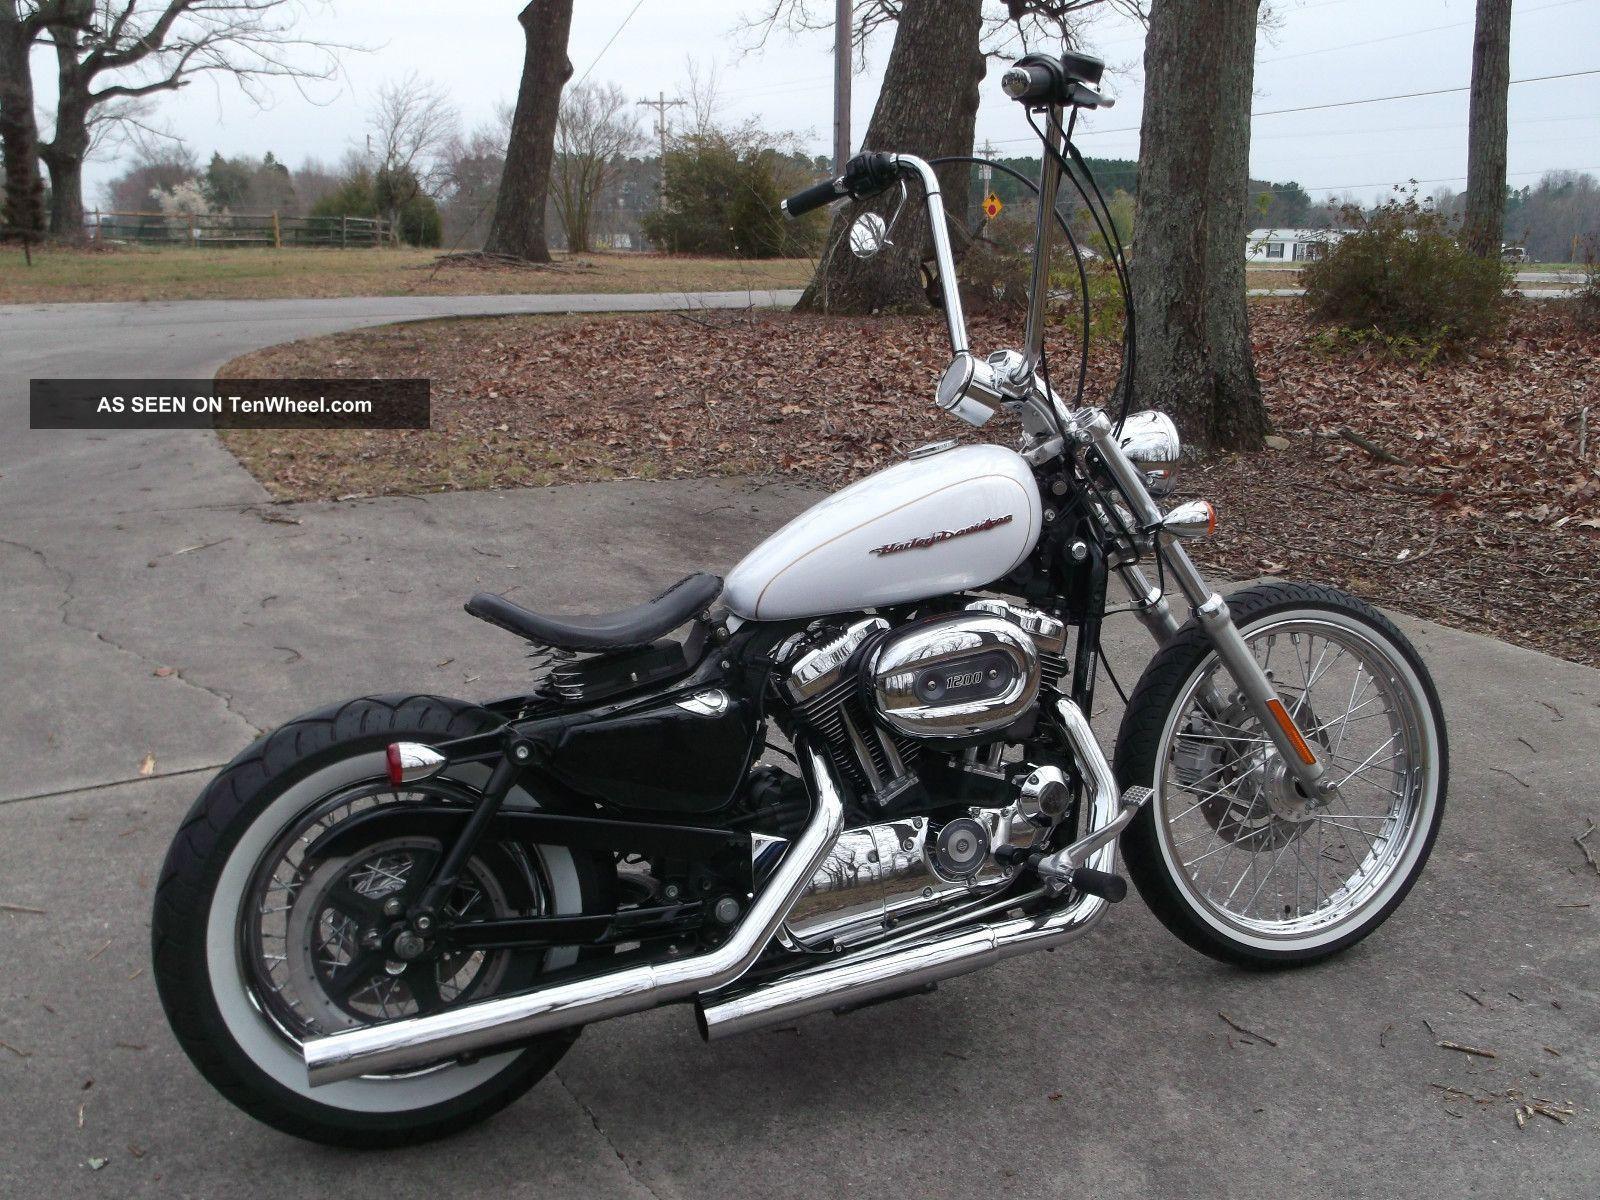 Harley Davidson Sportster Wallpaper 0059 1600x1200